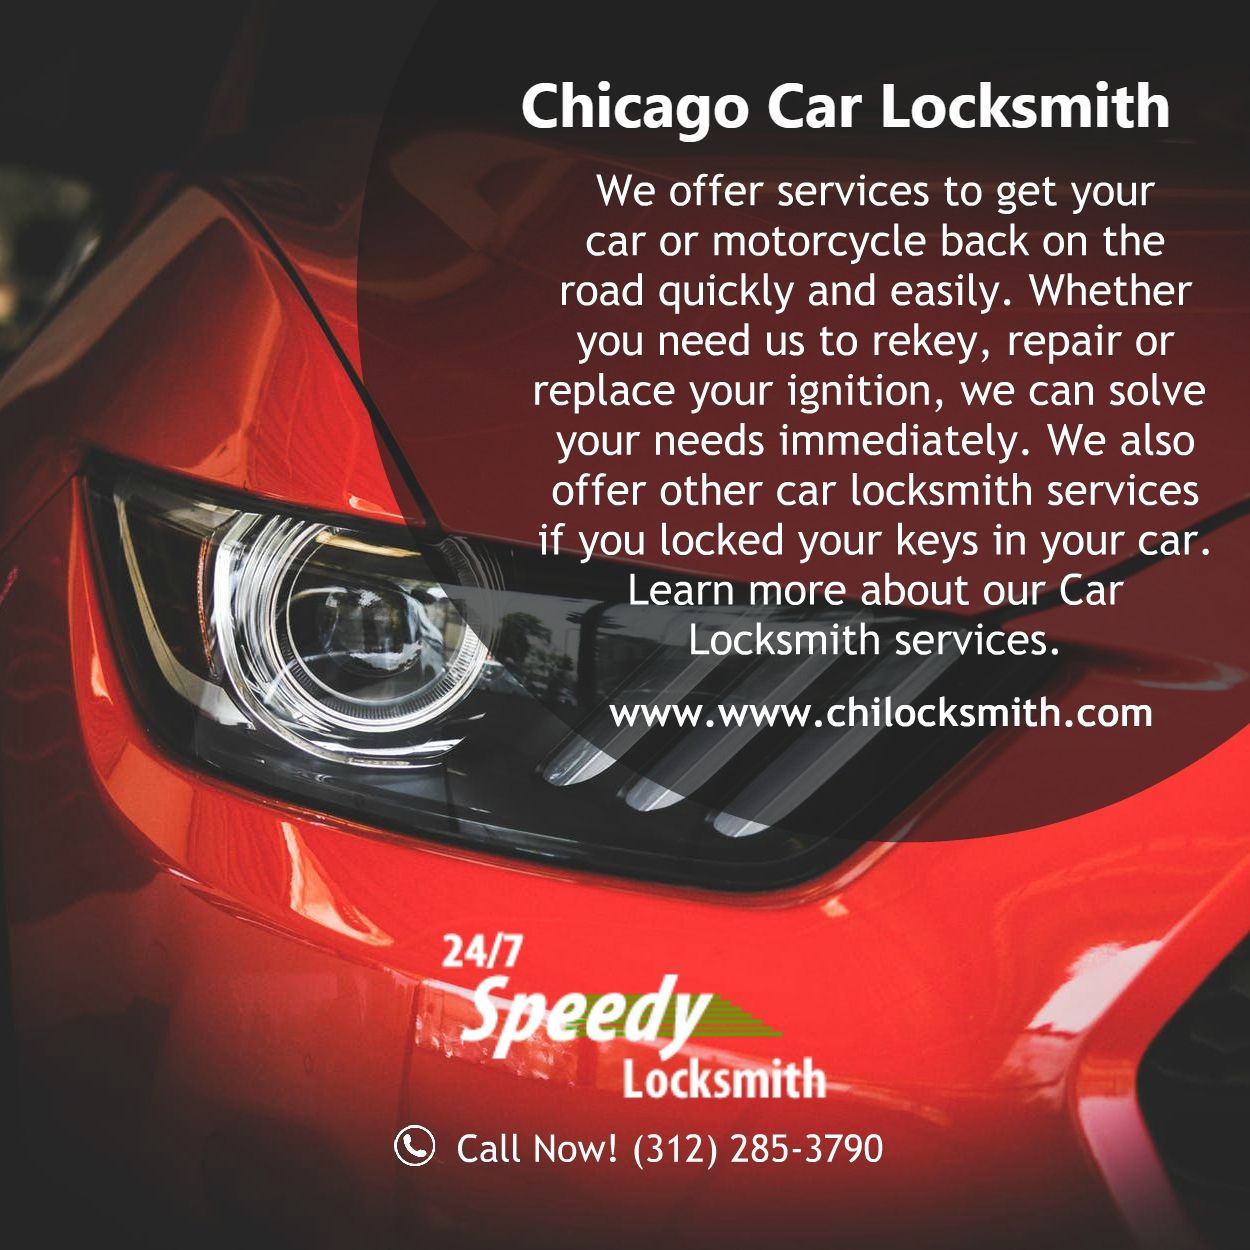 Chicago car locksmith